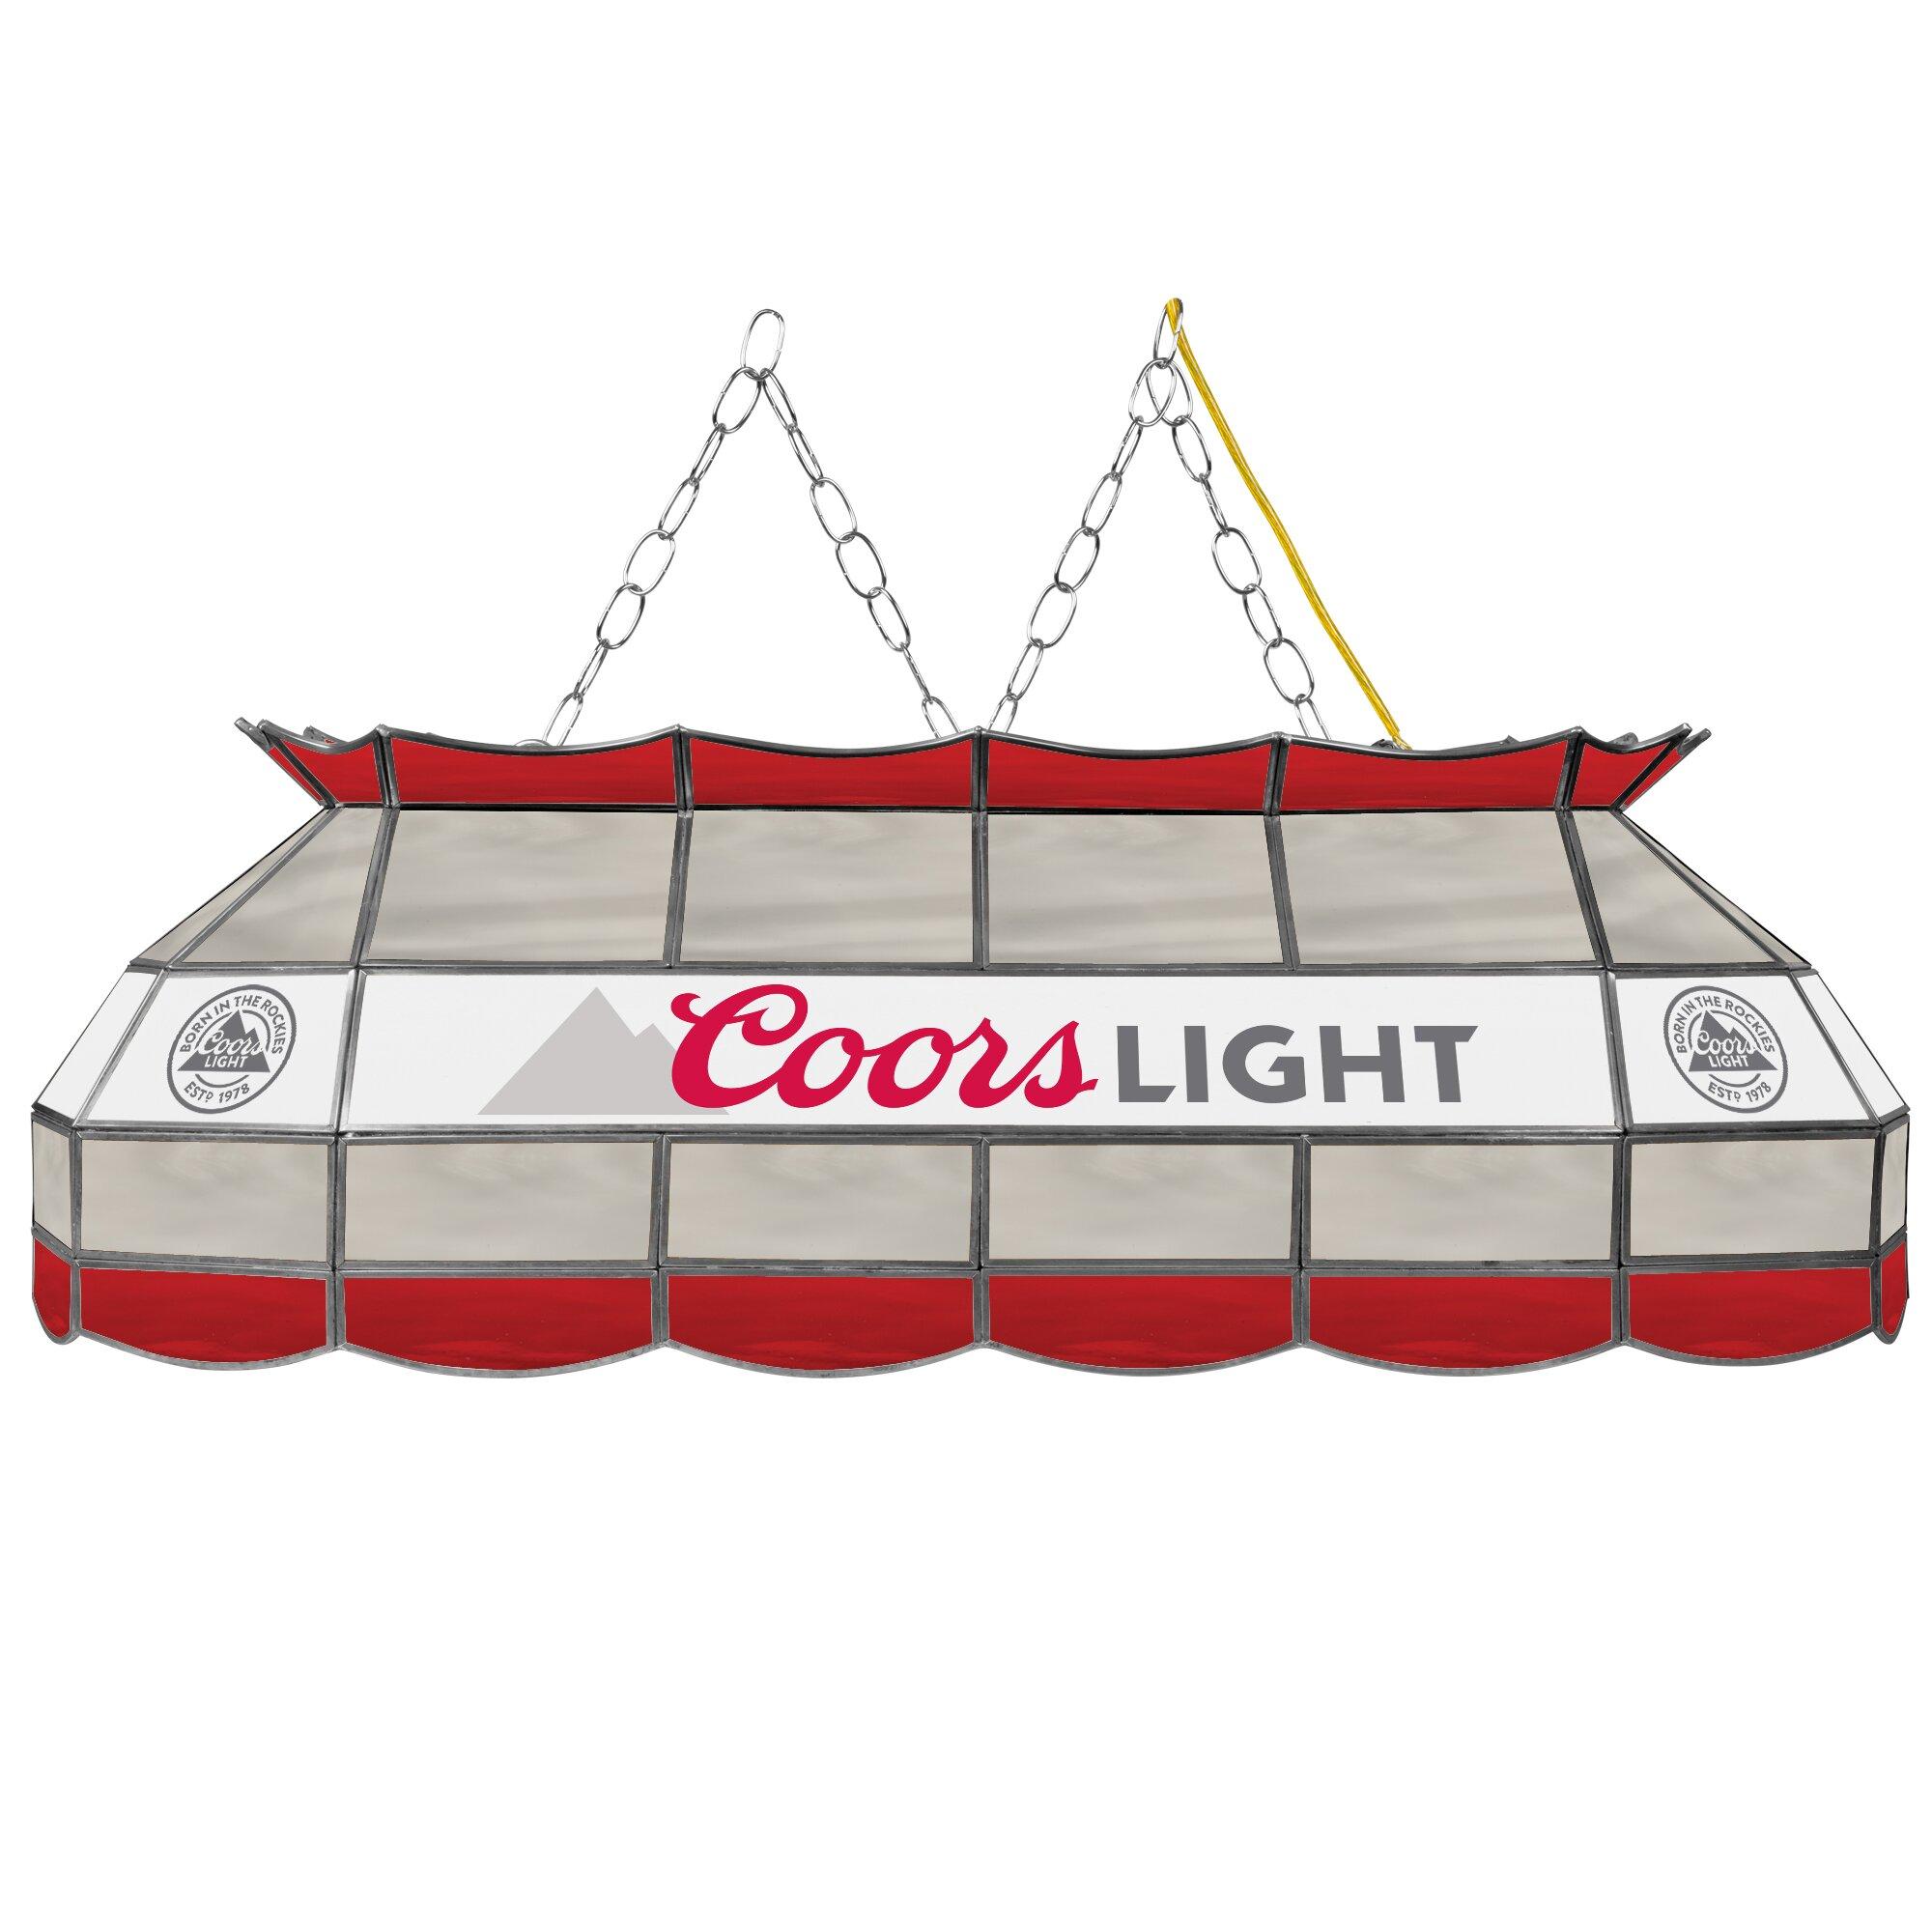 Miller Coors 3 Light Pool Table Light Wayfair